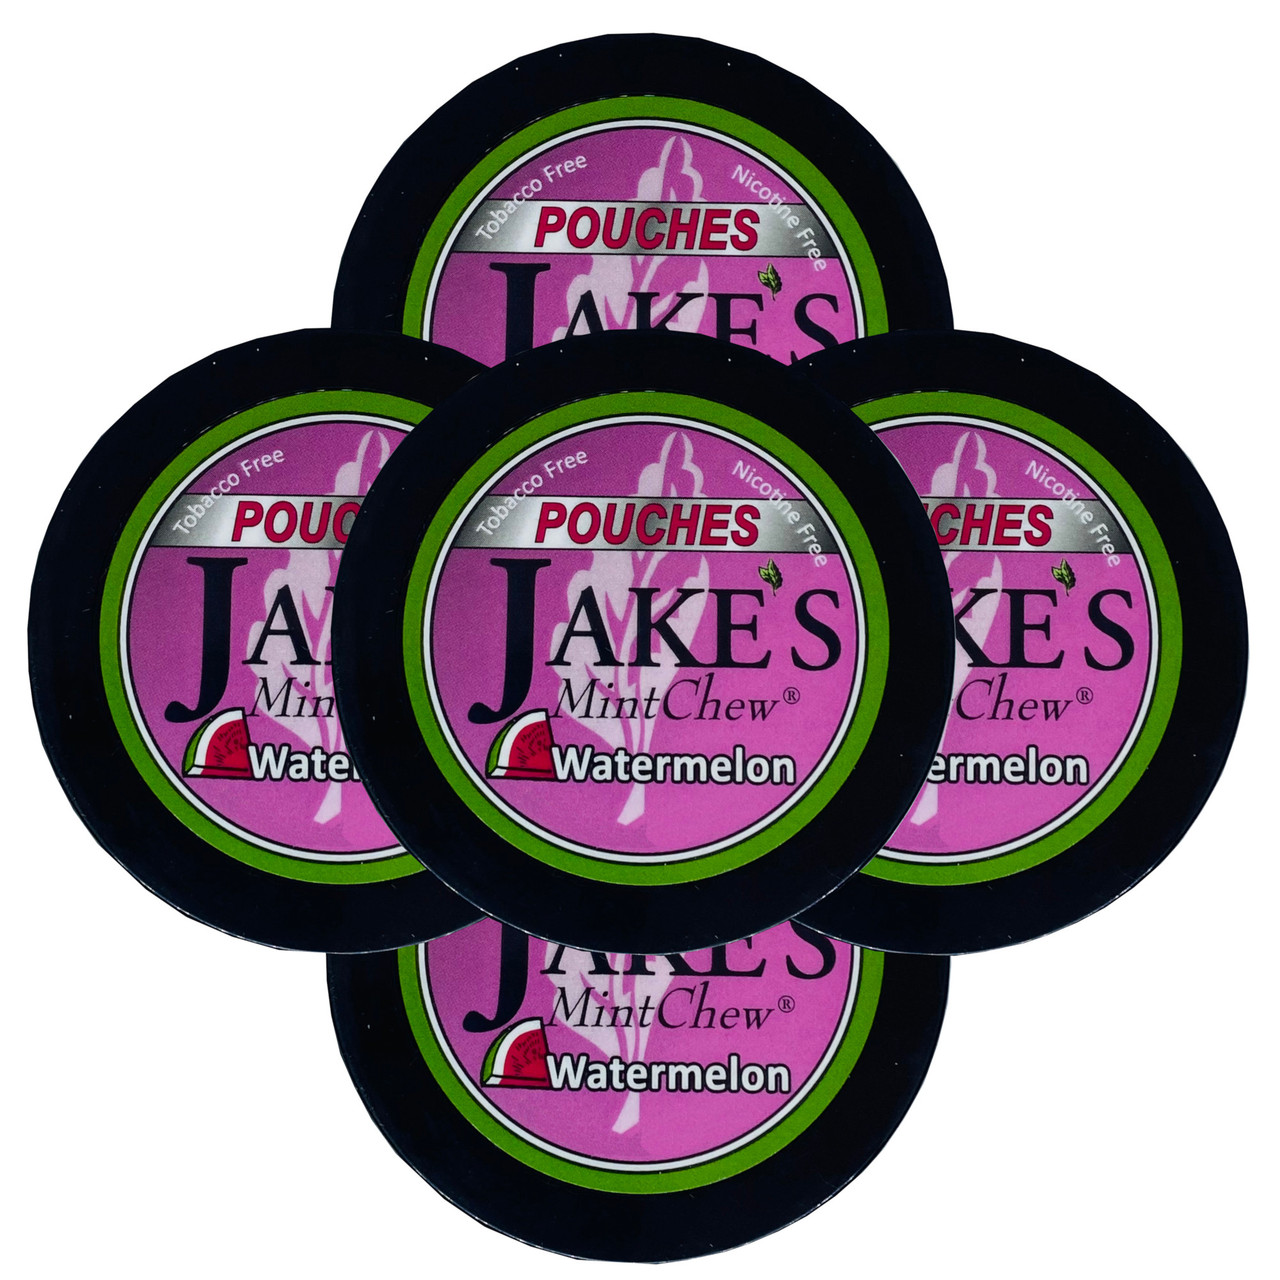 Jake's Mint Chew Pouches Watermelon 5 Cans